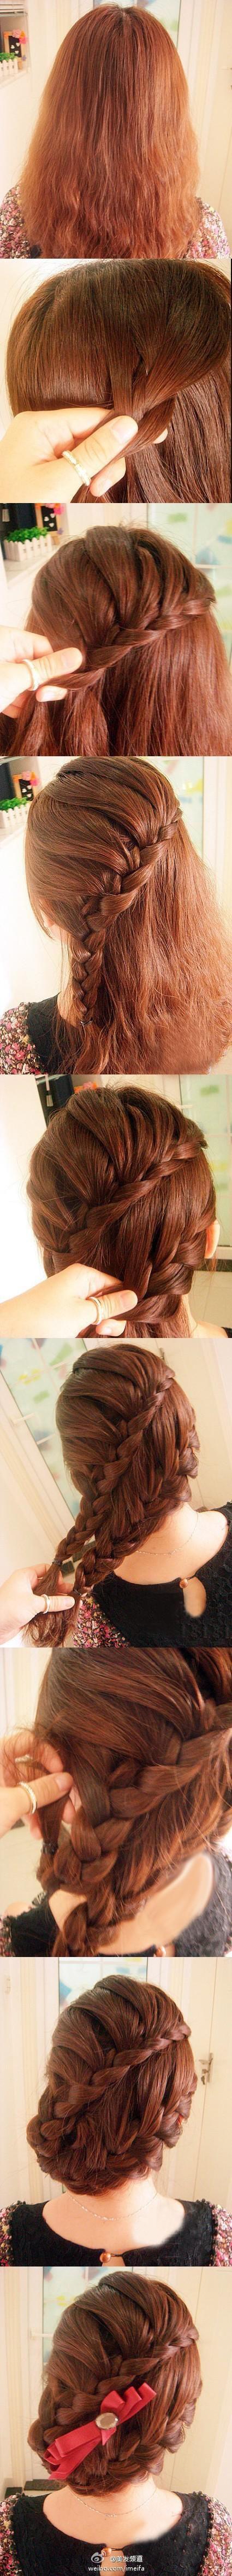 Double diagonal braid